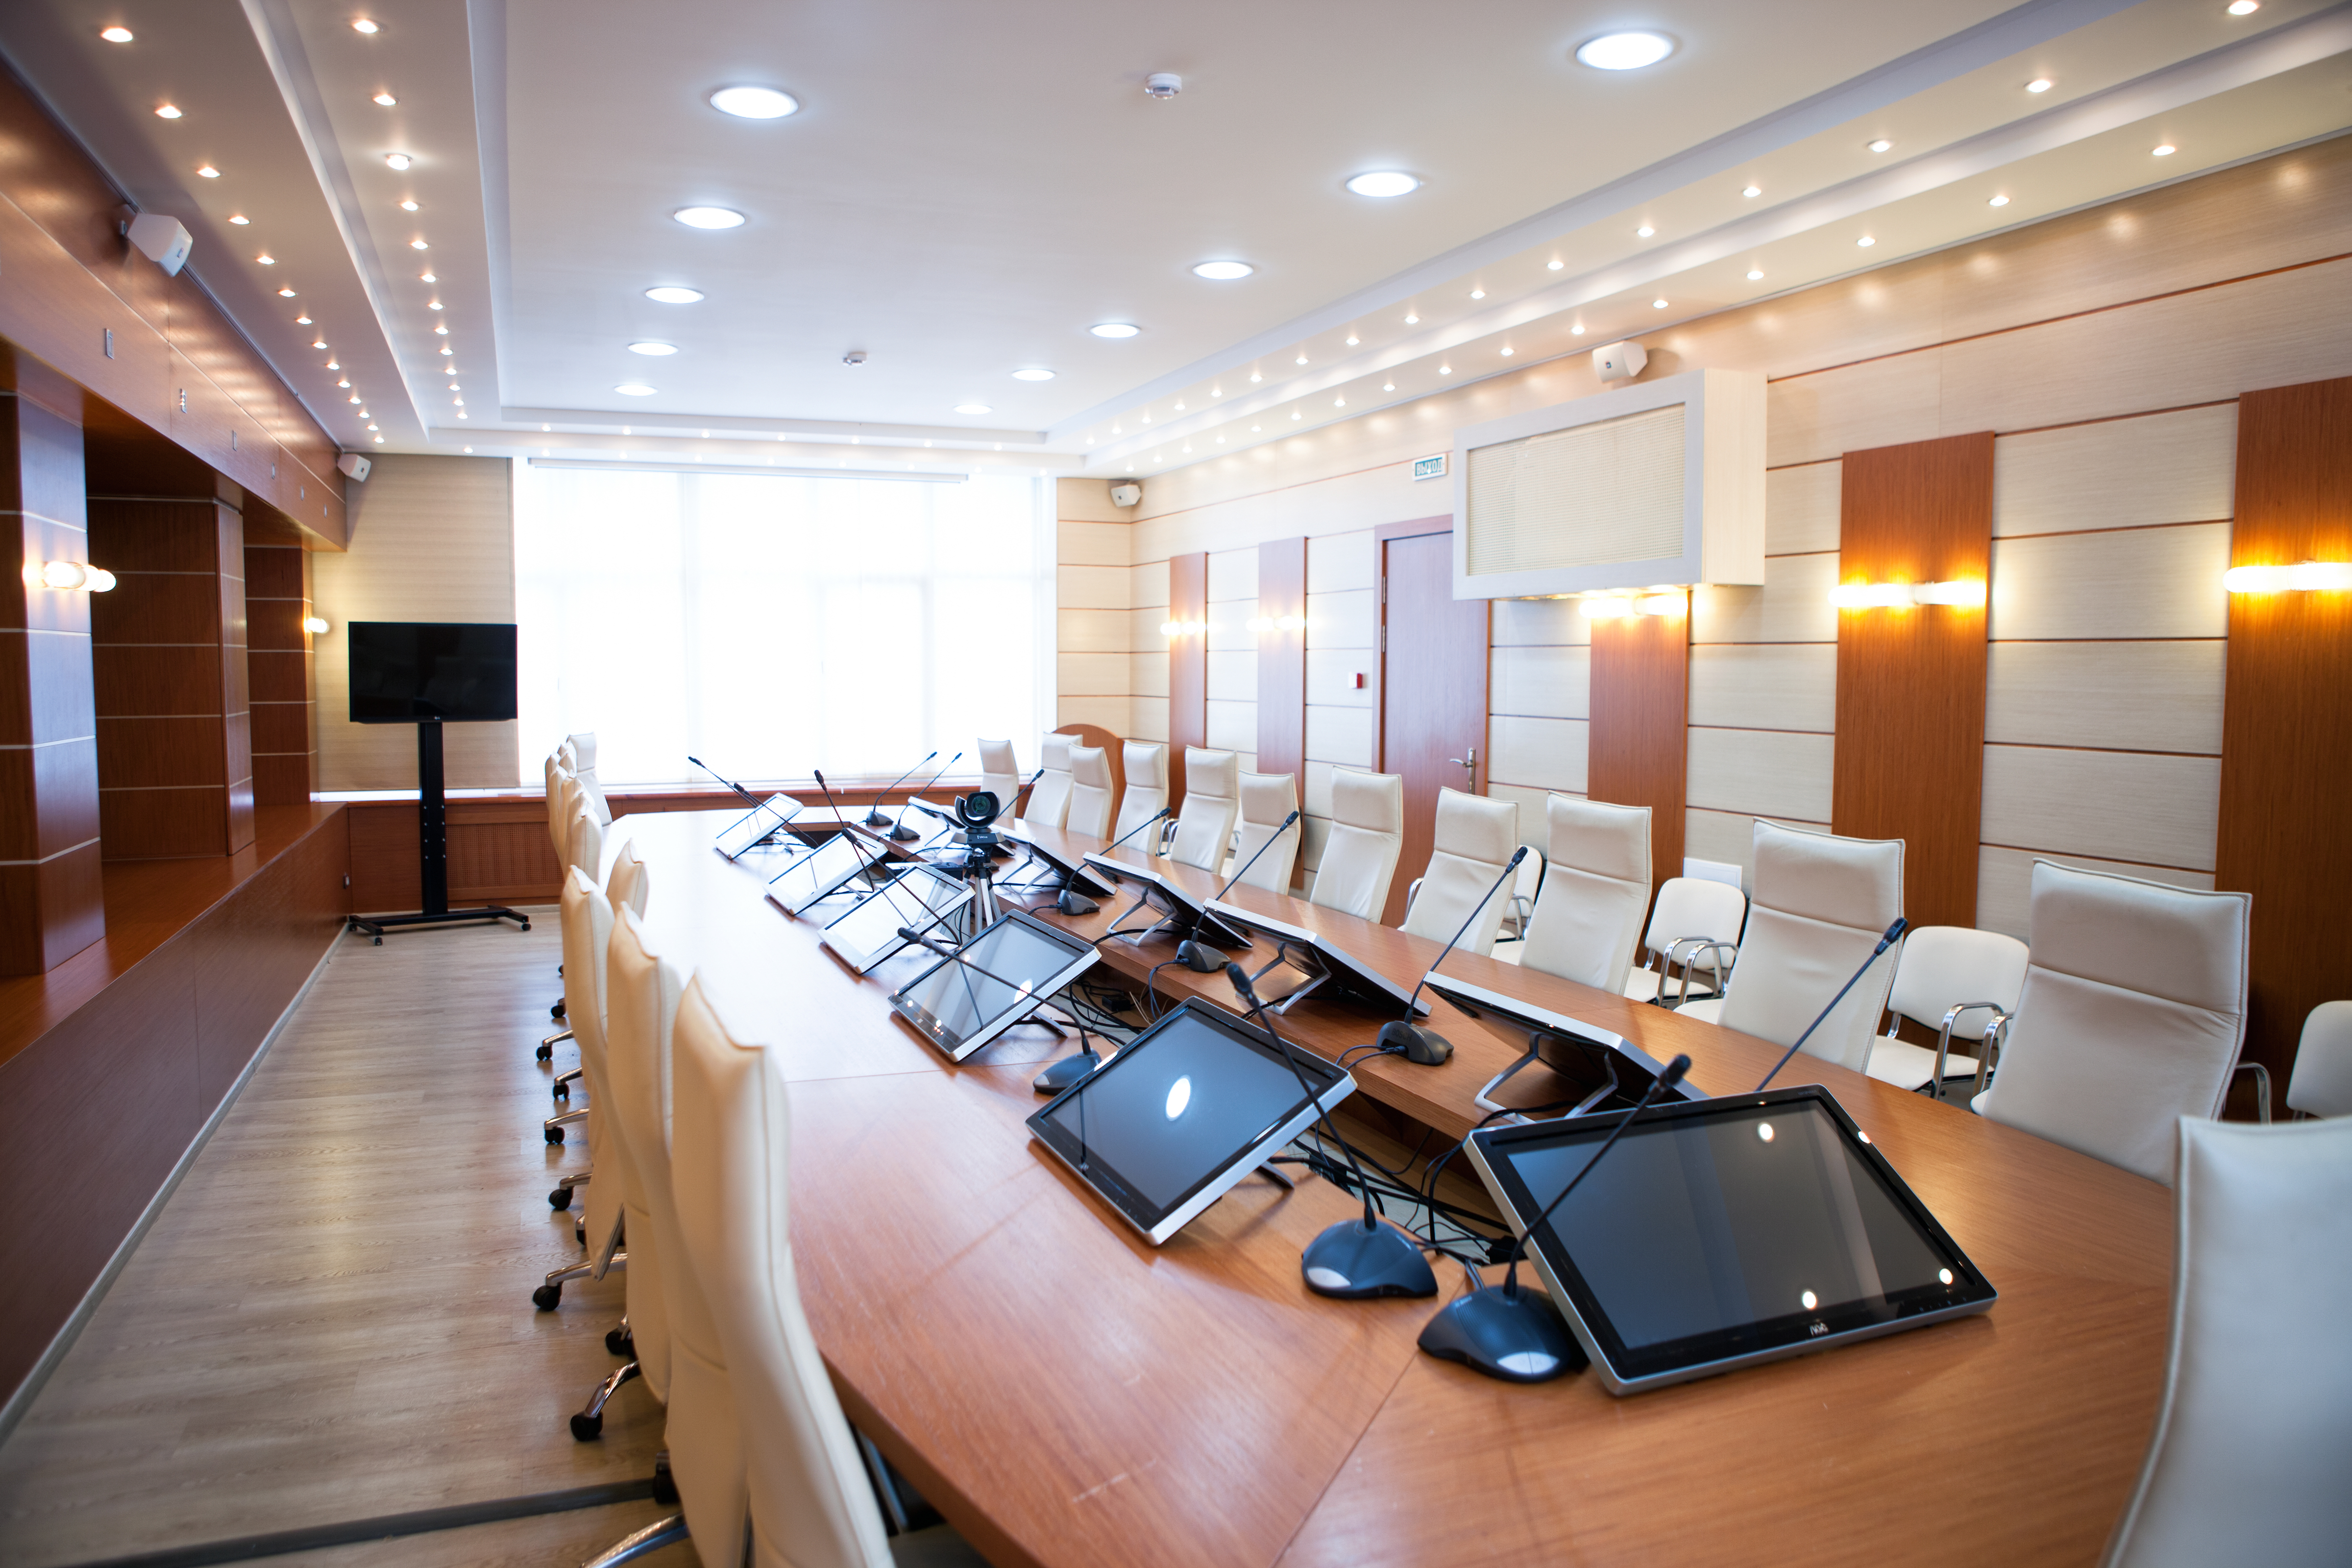 Business meeting room, Association, Room, Lamp, Lights, HQ Photo